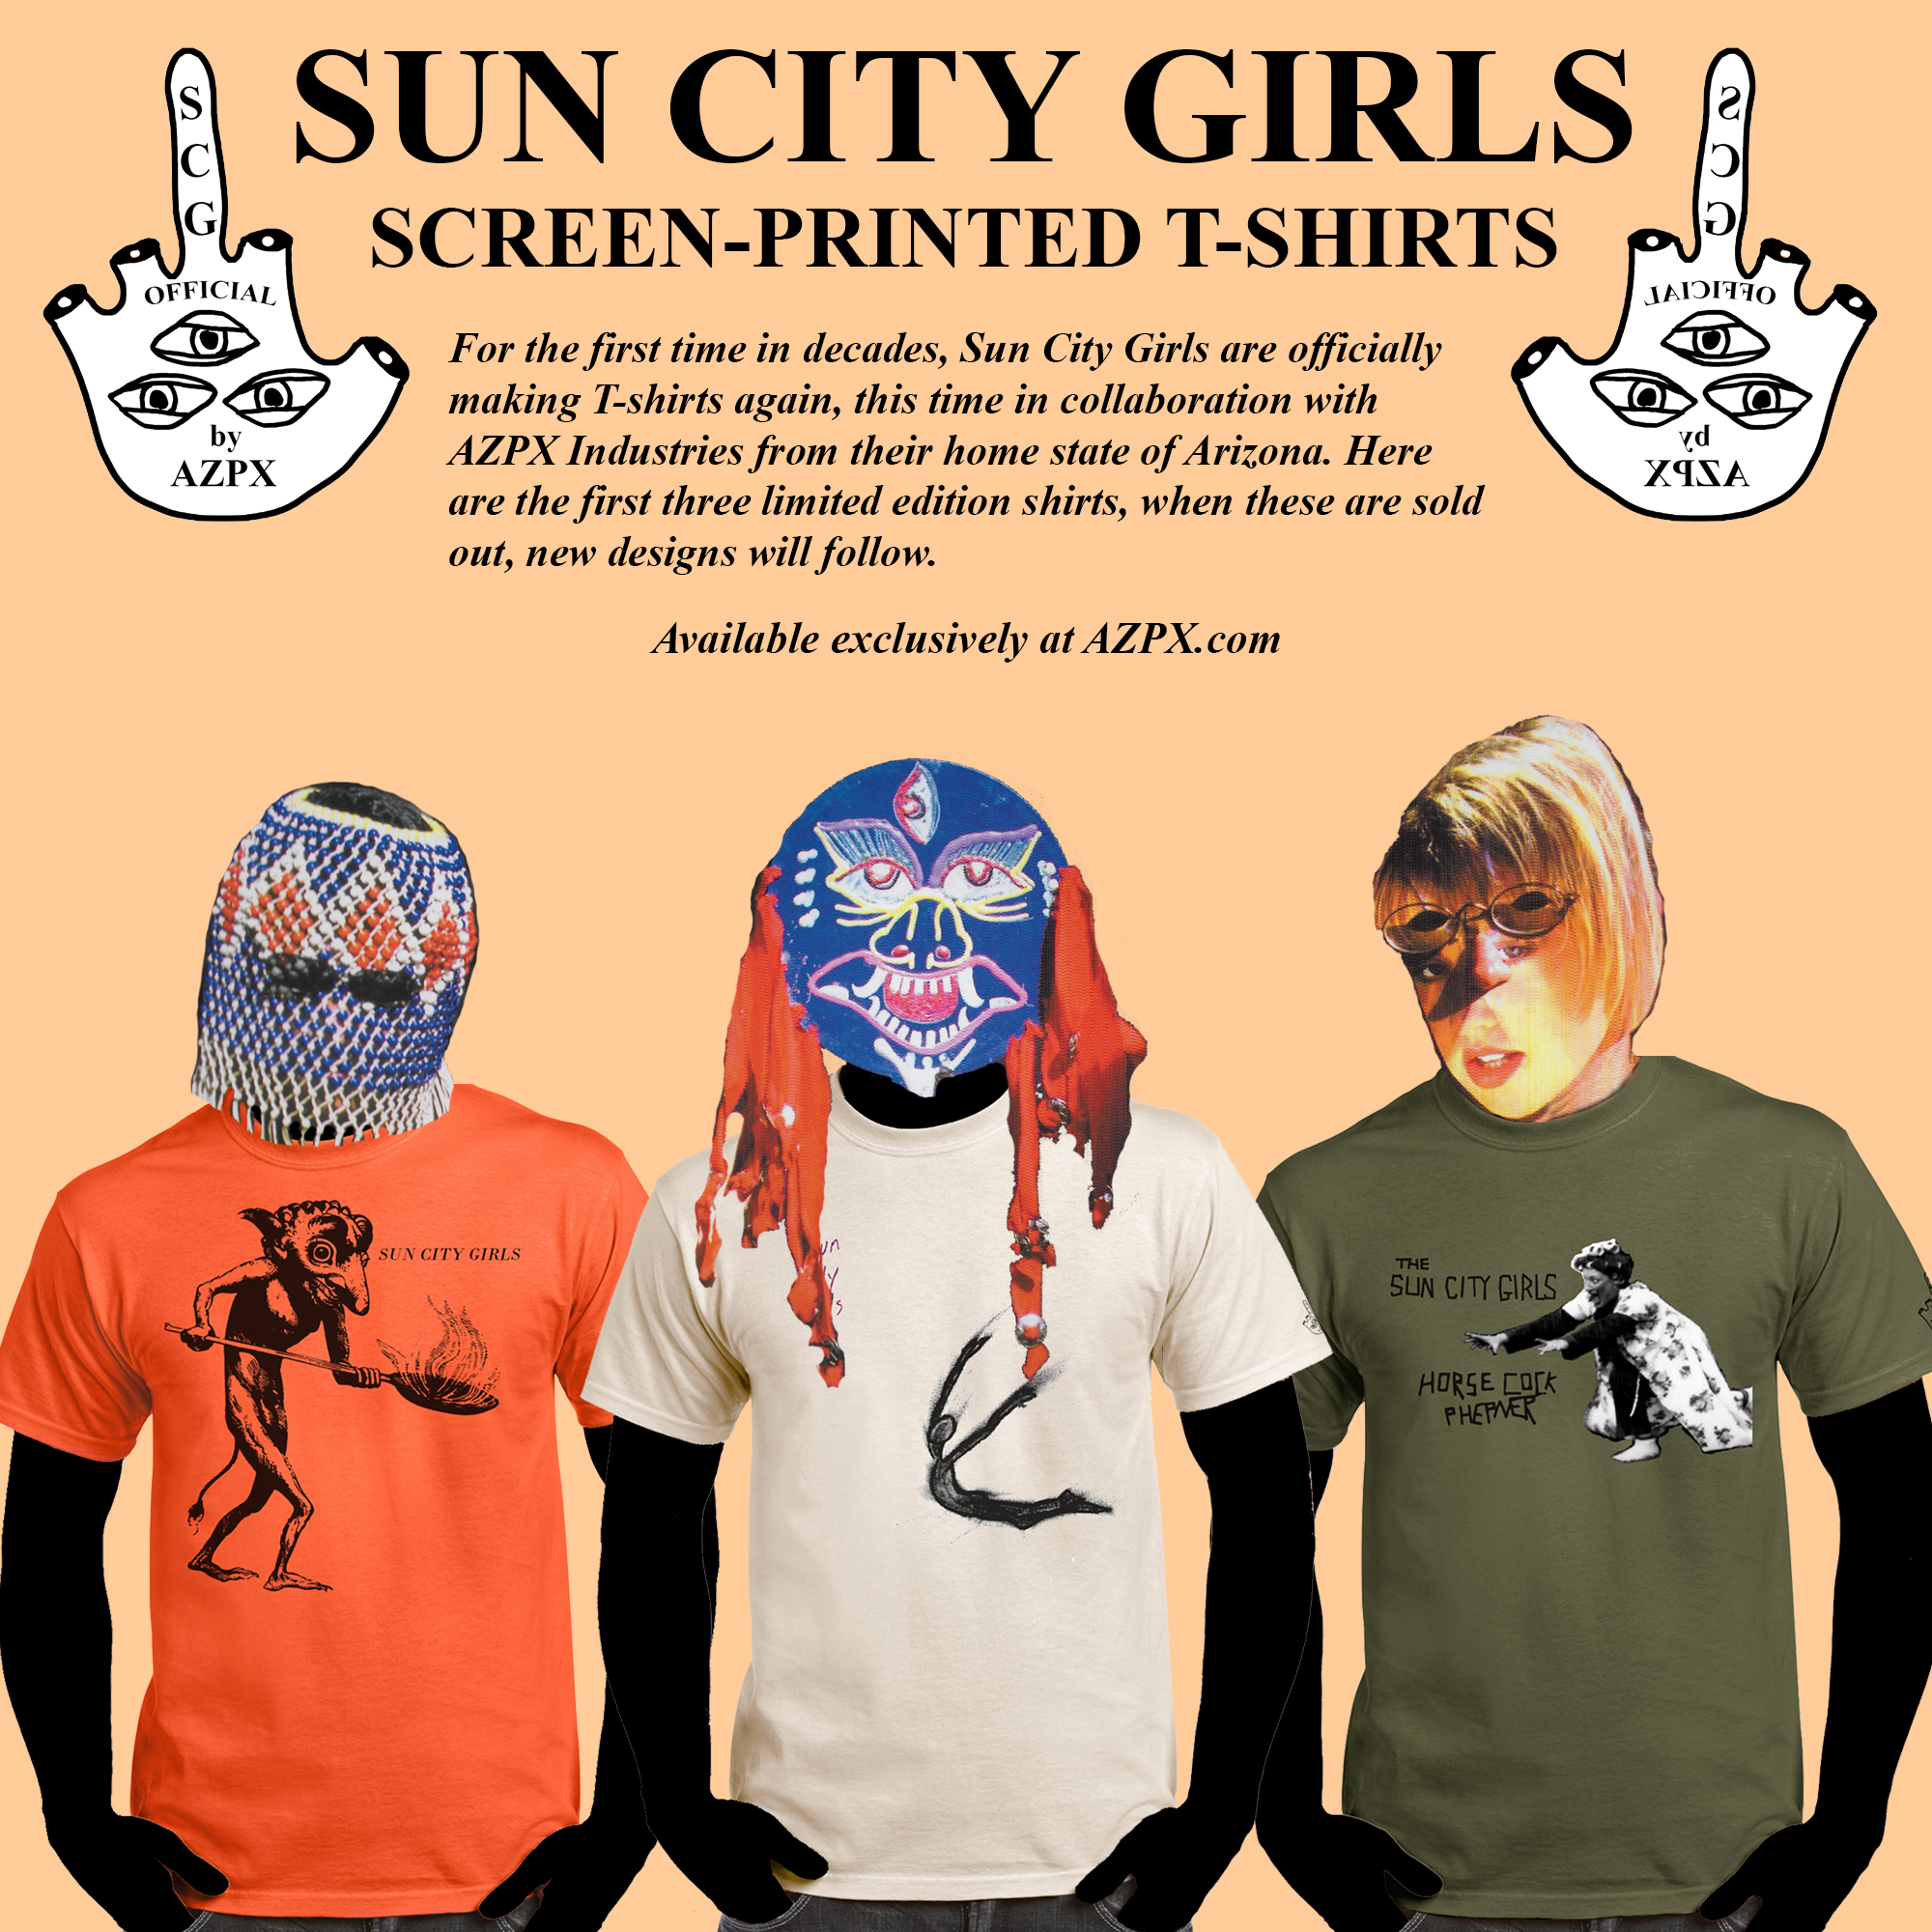 Sun-City-Girls-Shirts-Advertisement2